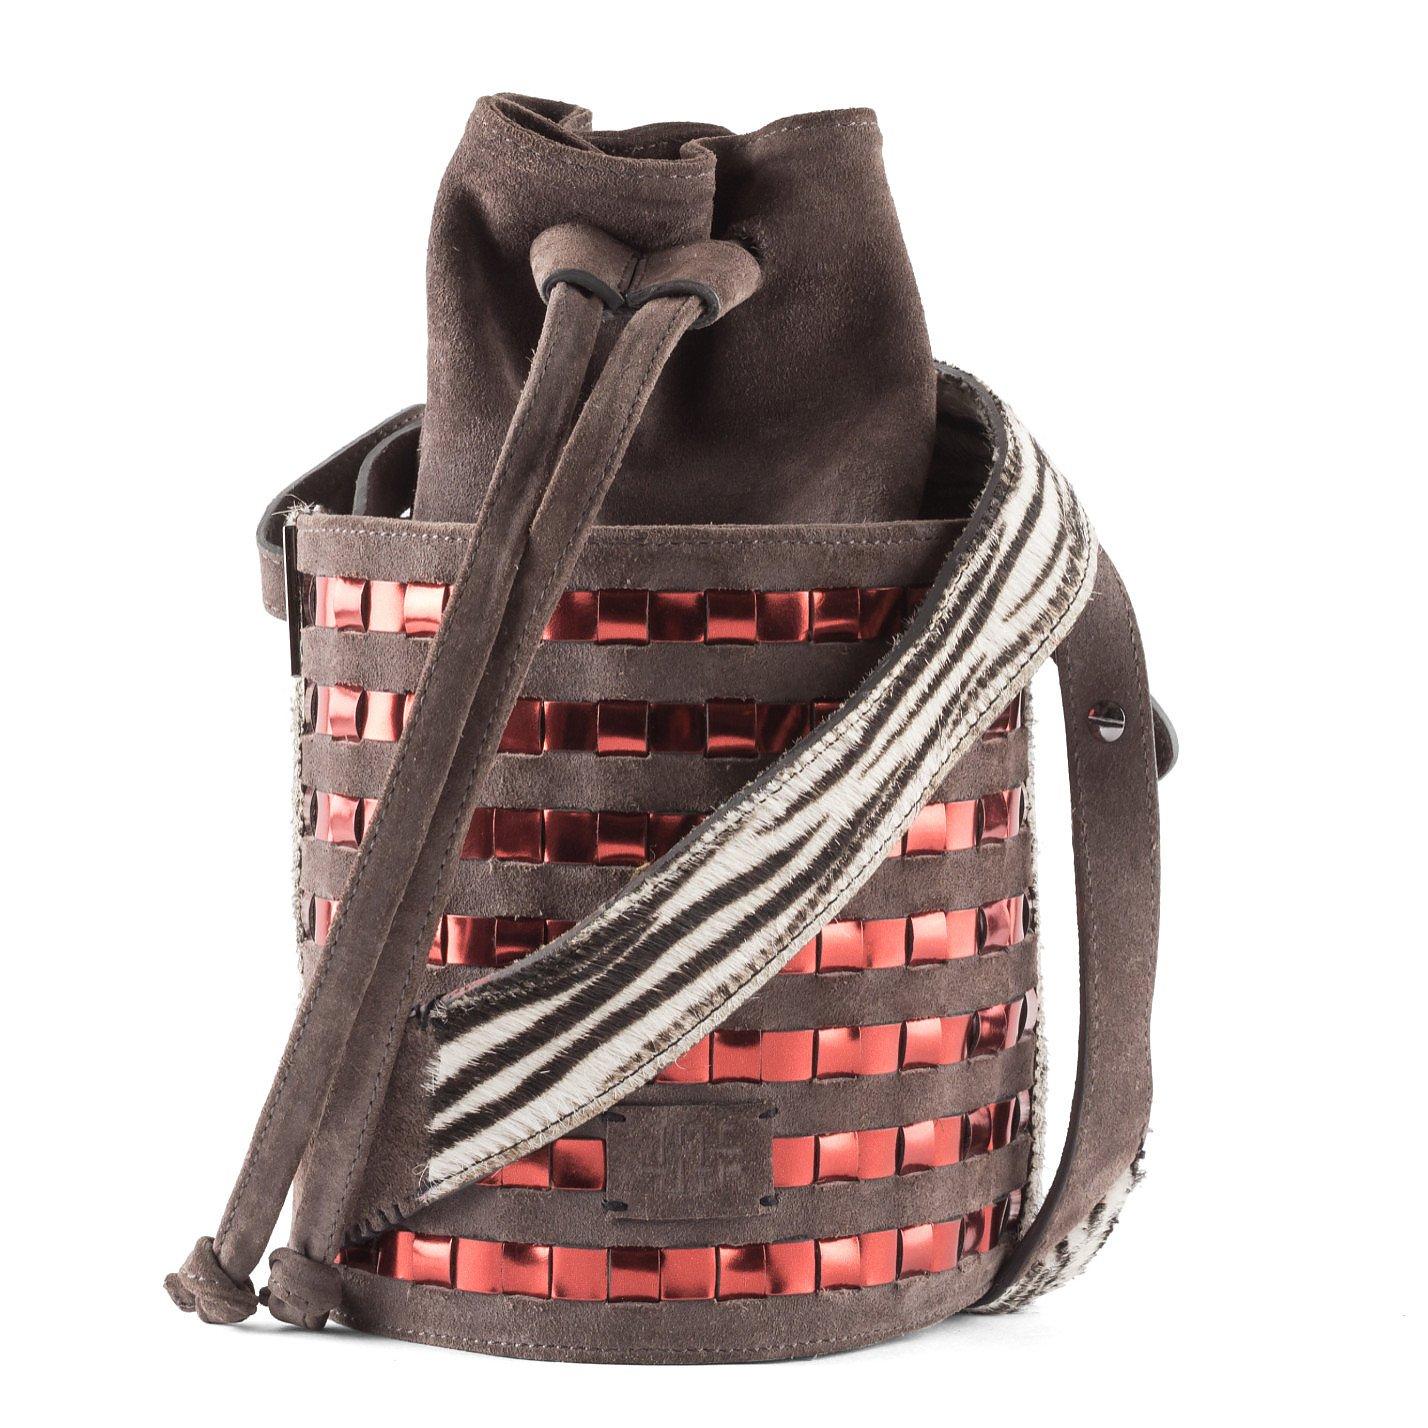 Carolina Wong Simone Woven Bucket Bag with Zebra Detail